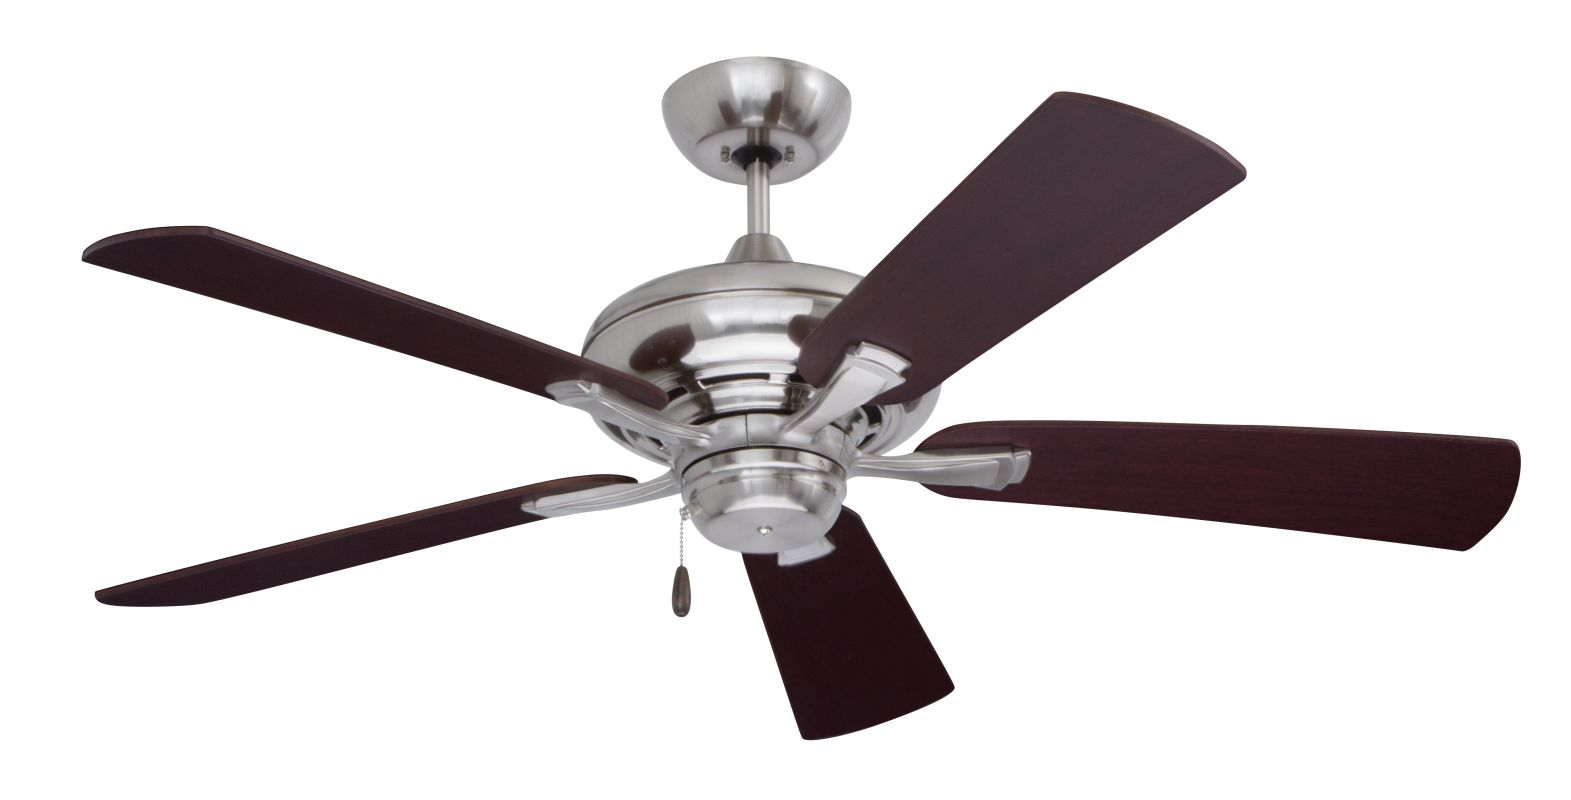 "Emerson CF772 Monterey II 52"" 5 Blade Ceiling Fan - Blades Included"